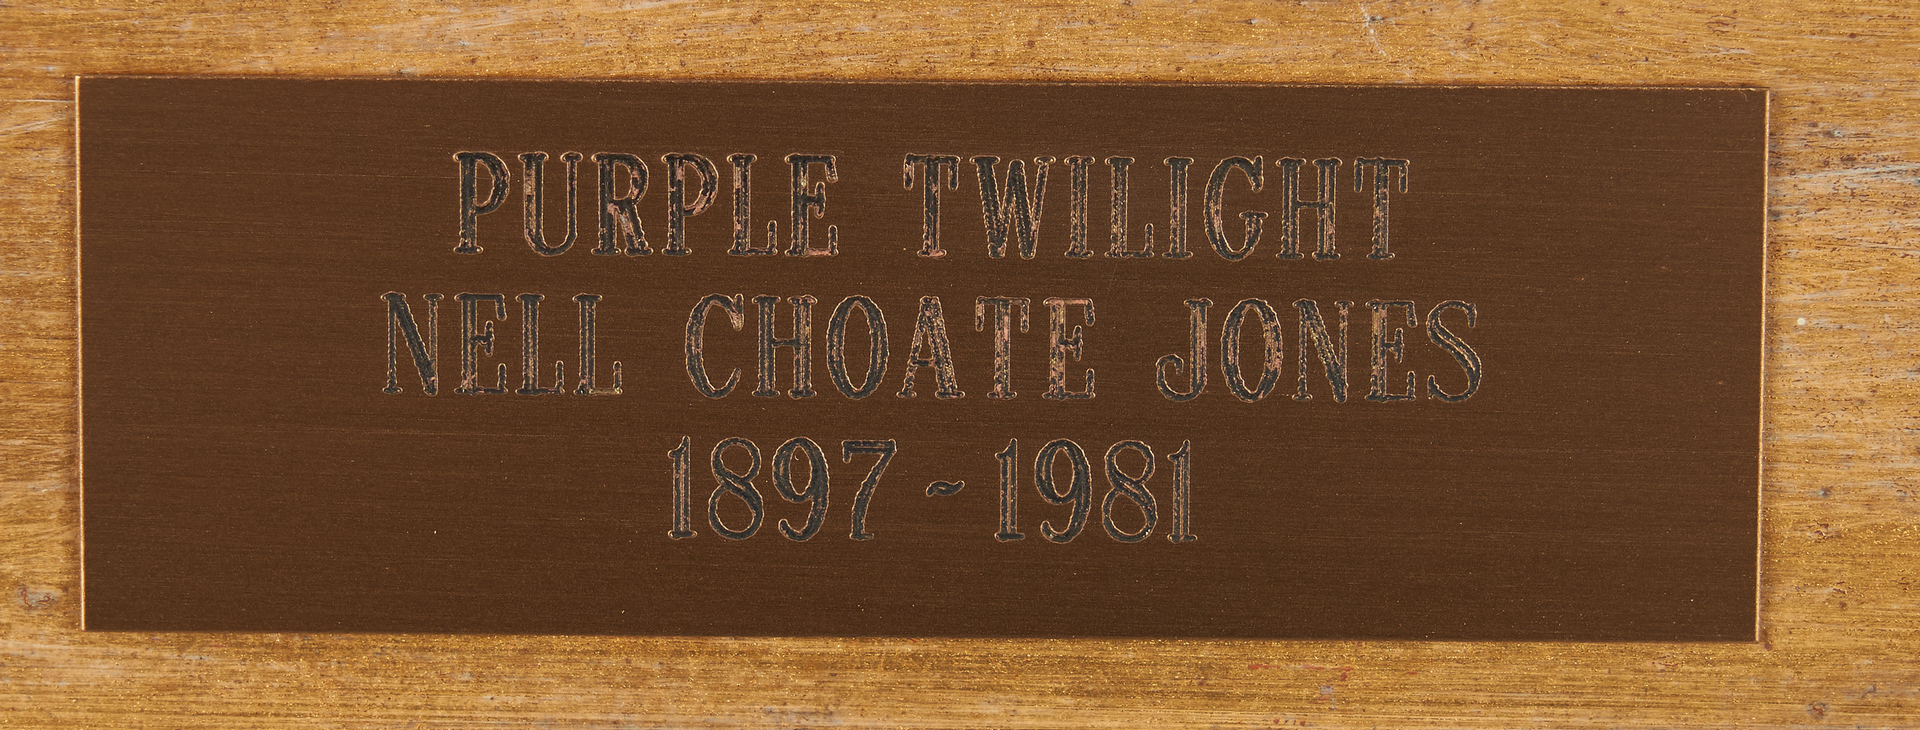 Lot 134: Exhibited Nell Choate Jones O/C Painting, Purple Twilight